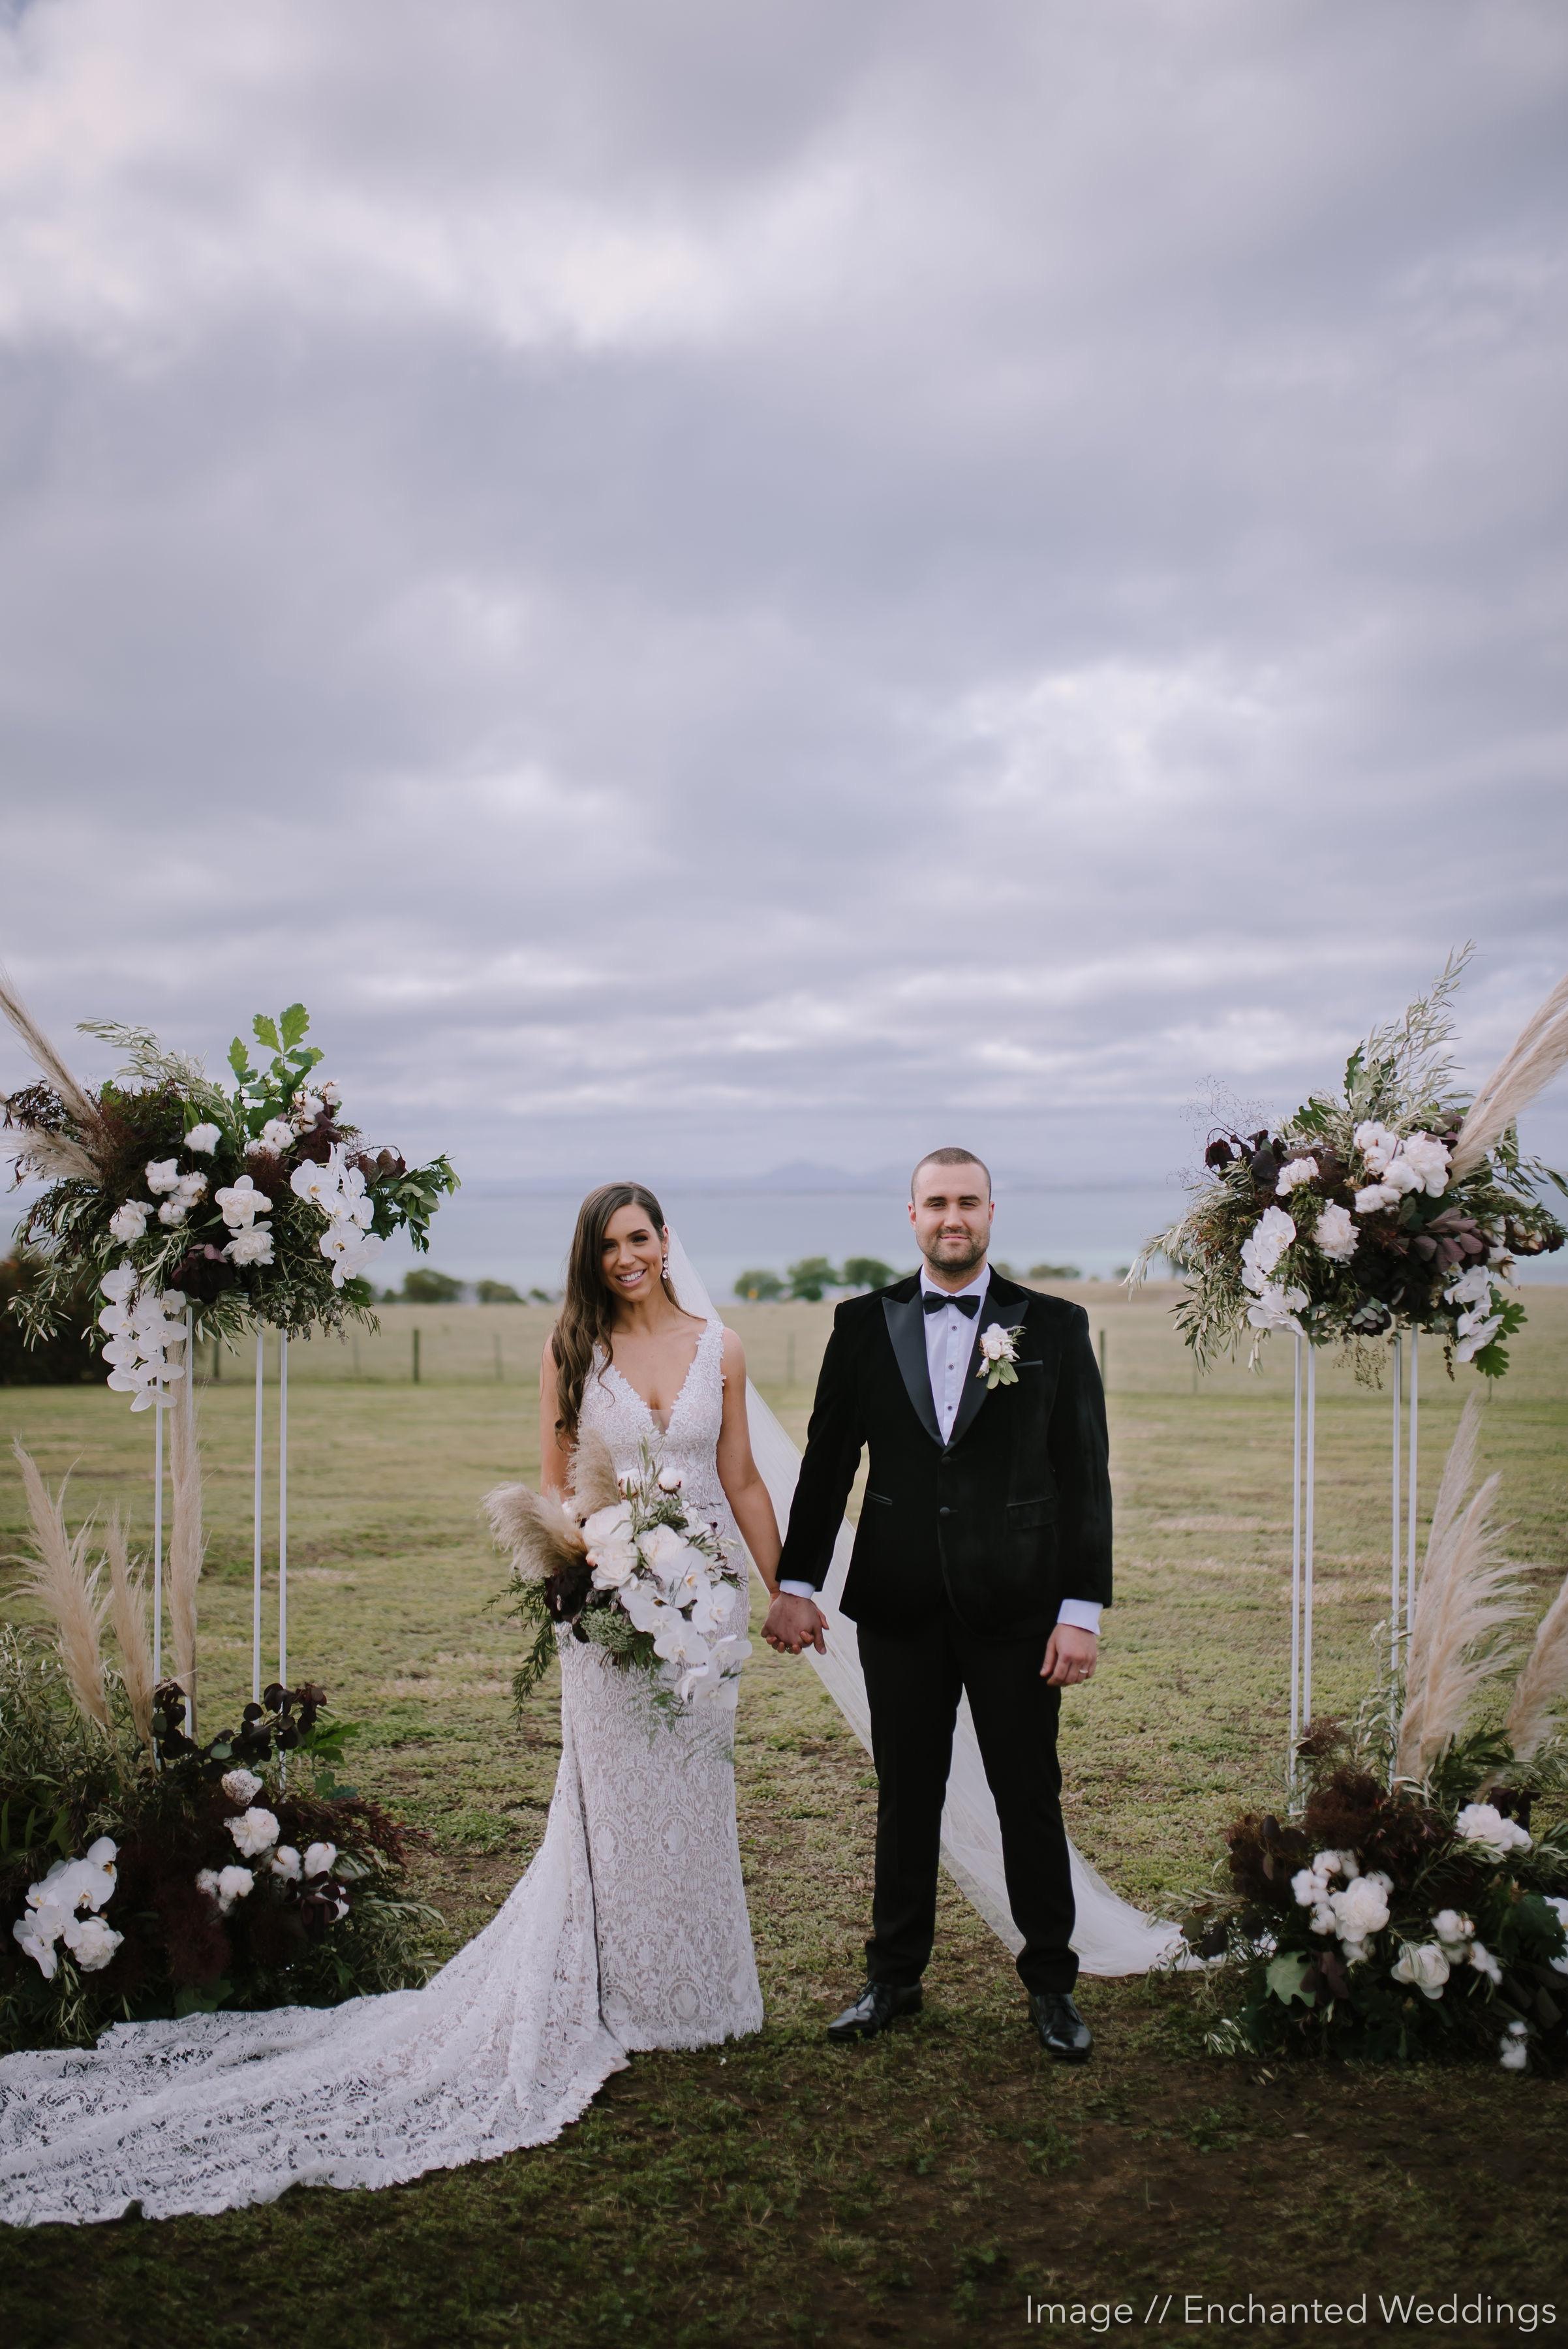 K+B Enchanted Weddings 2.jpg